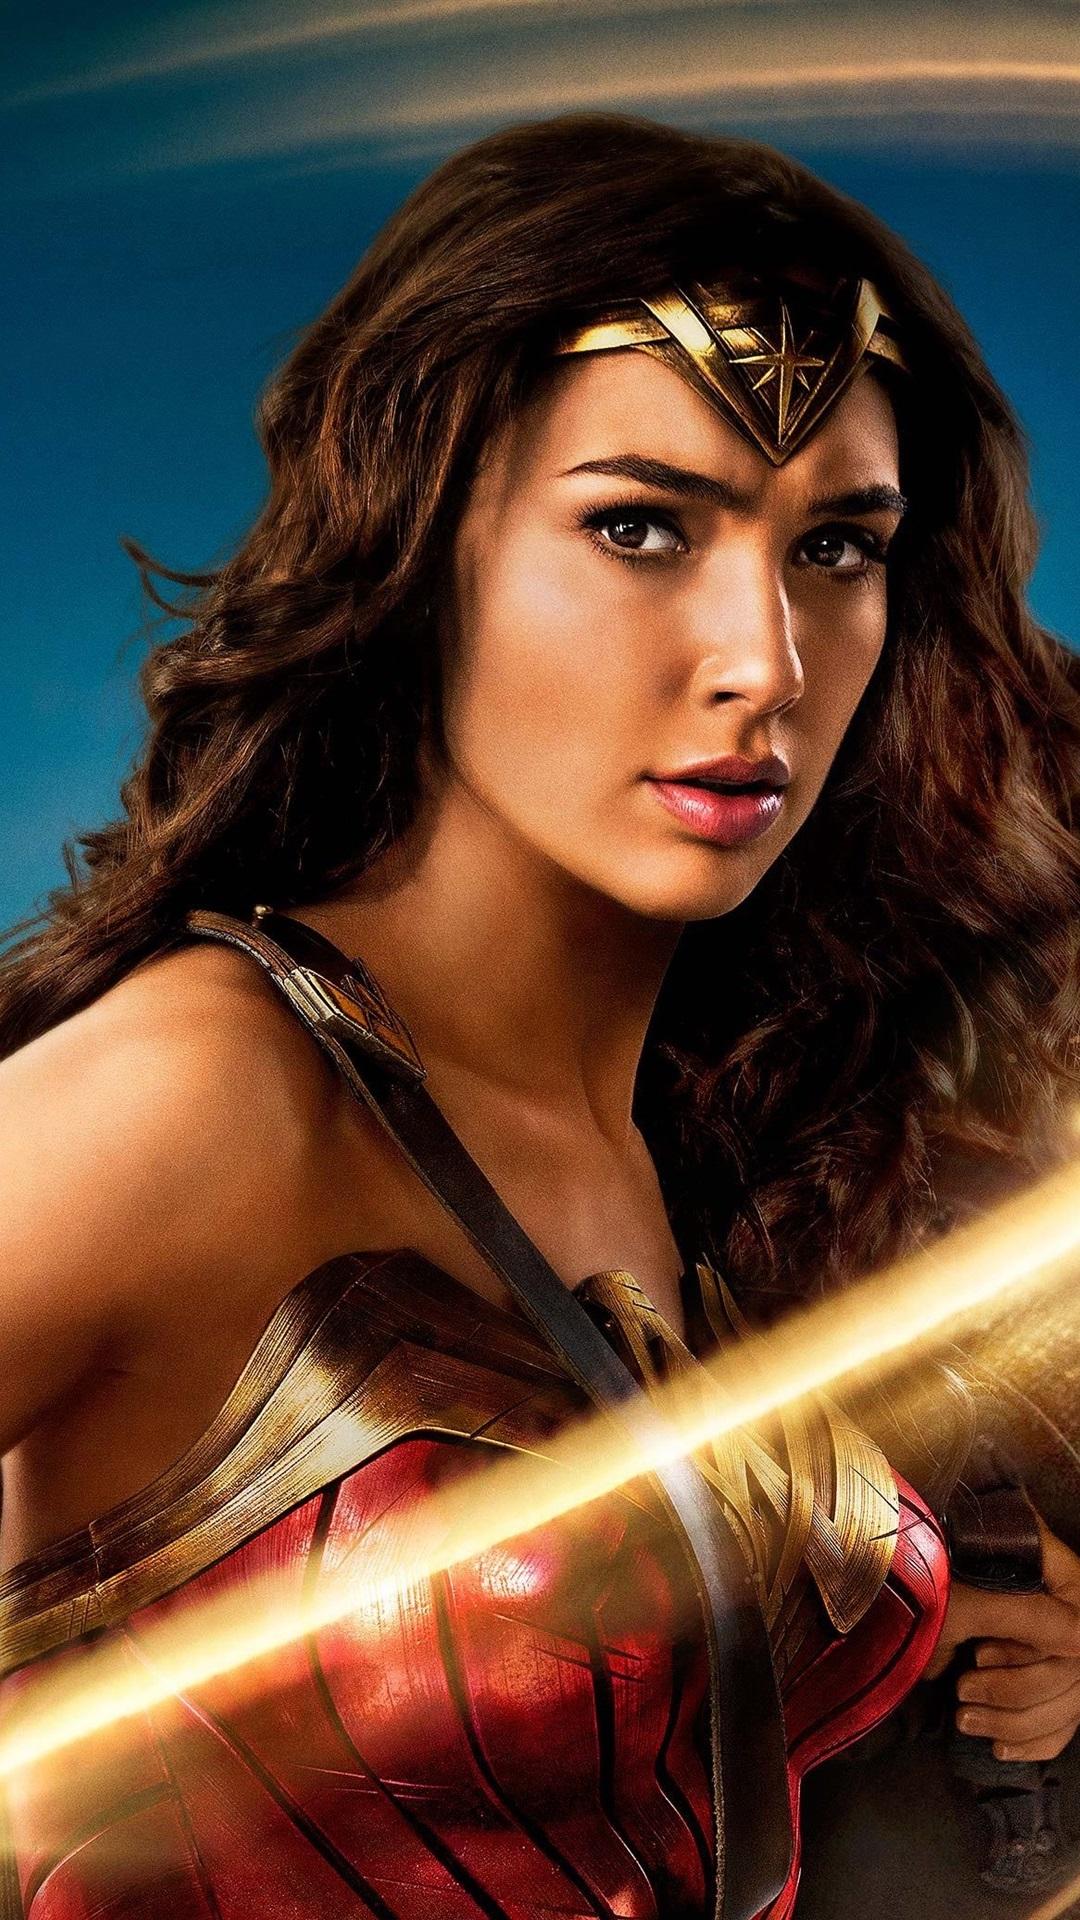 Wallpaper Wonder Woman Gal Gadot Sword Light 2560x1920 Hd